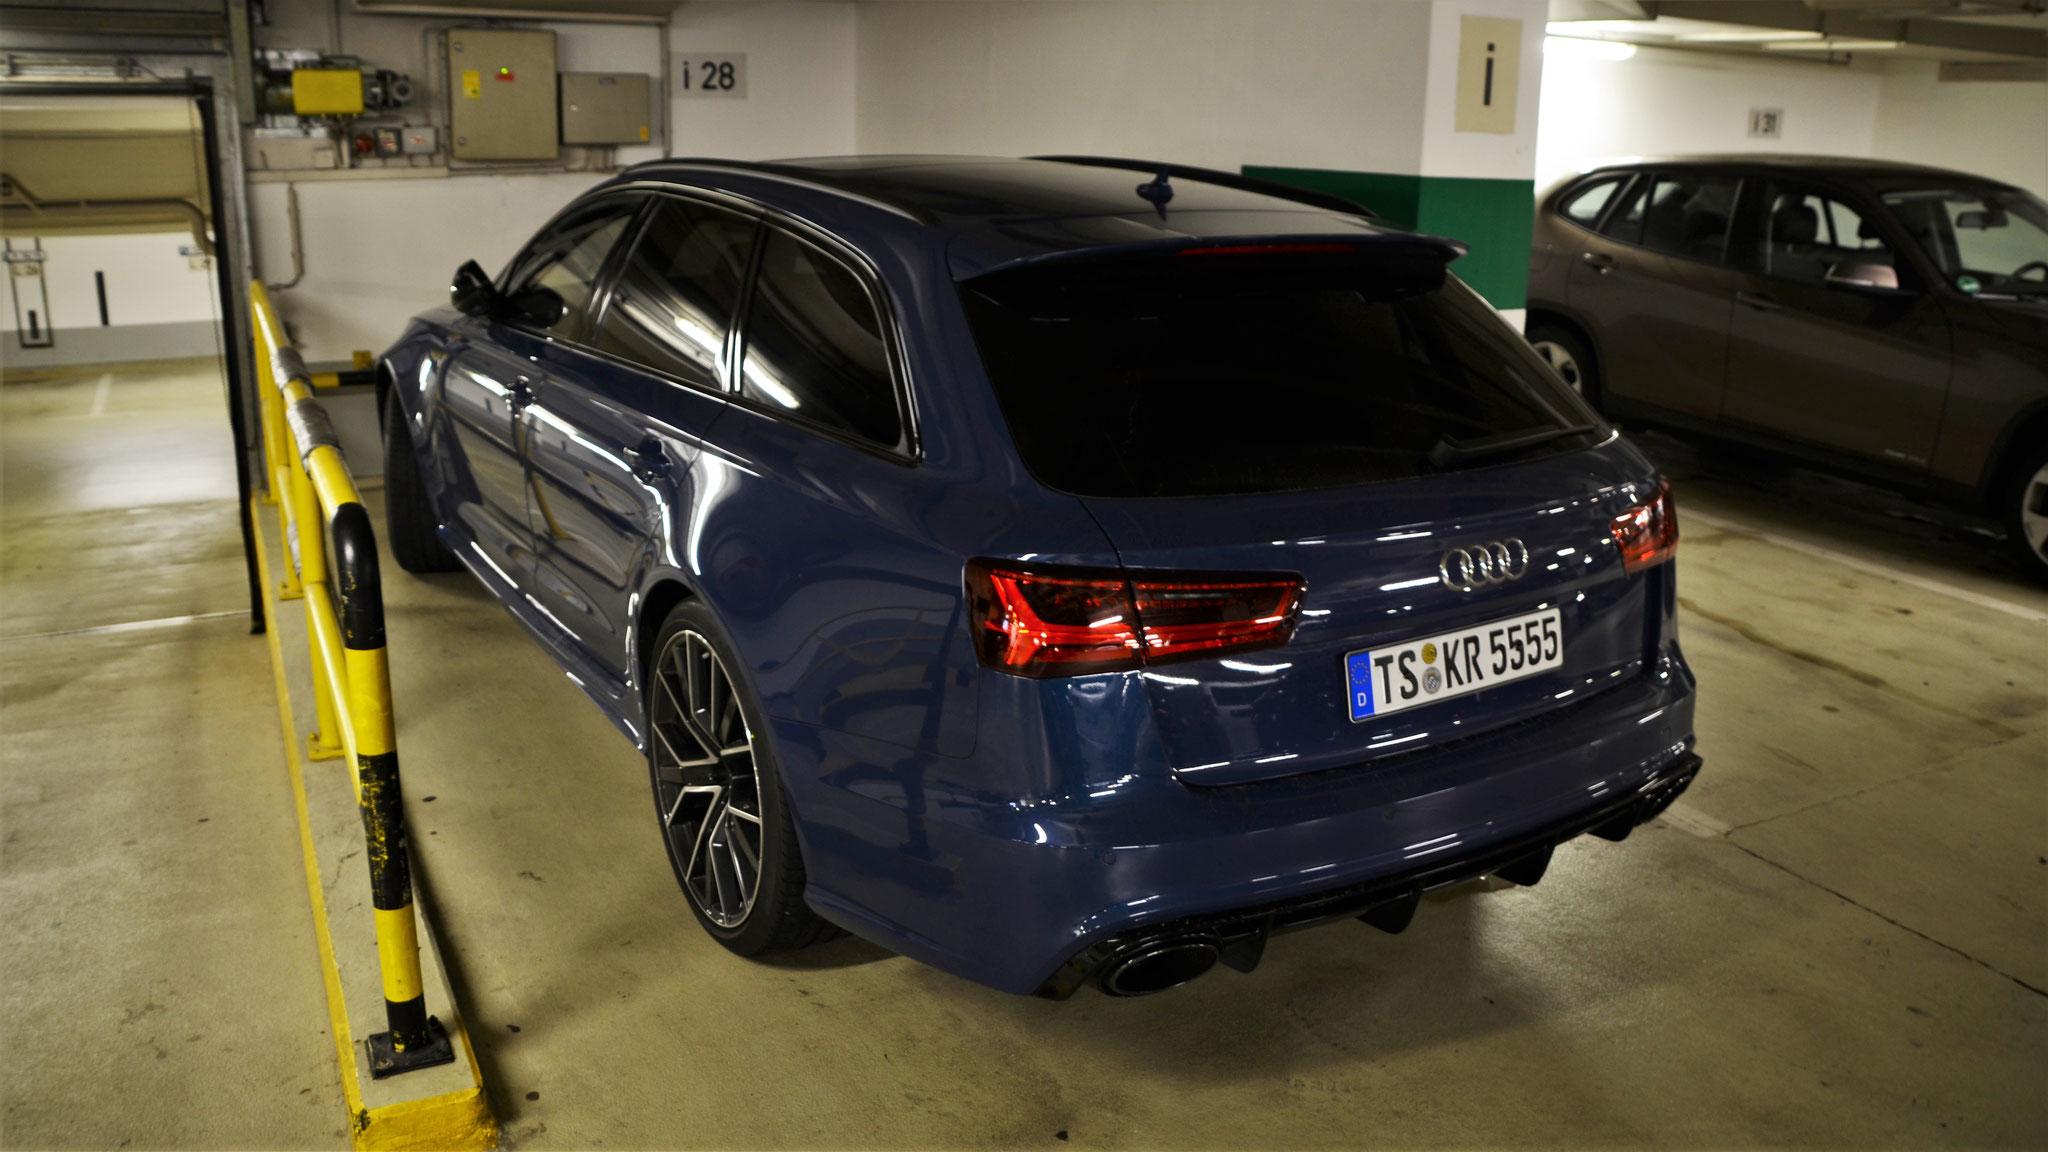 Audi RS6 Performance Nogaro Edition - TS-KR-5555